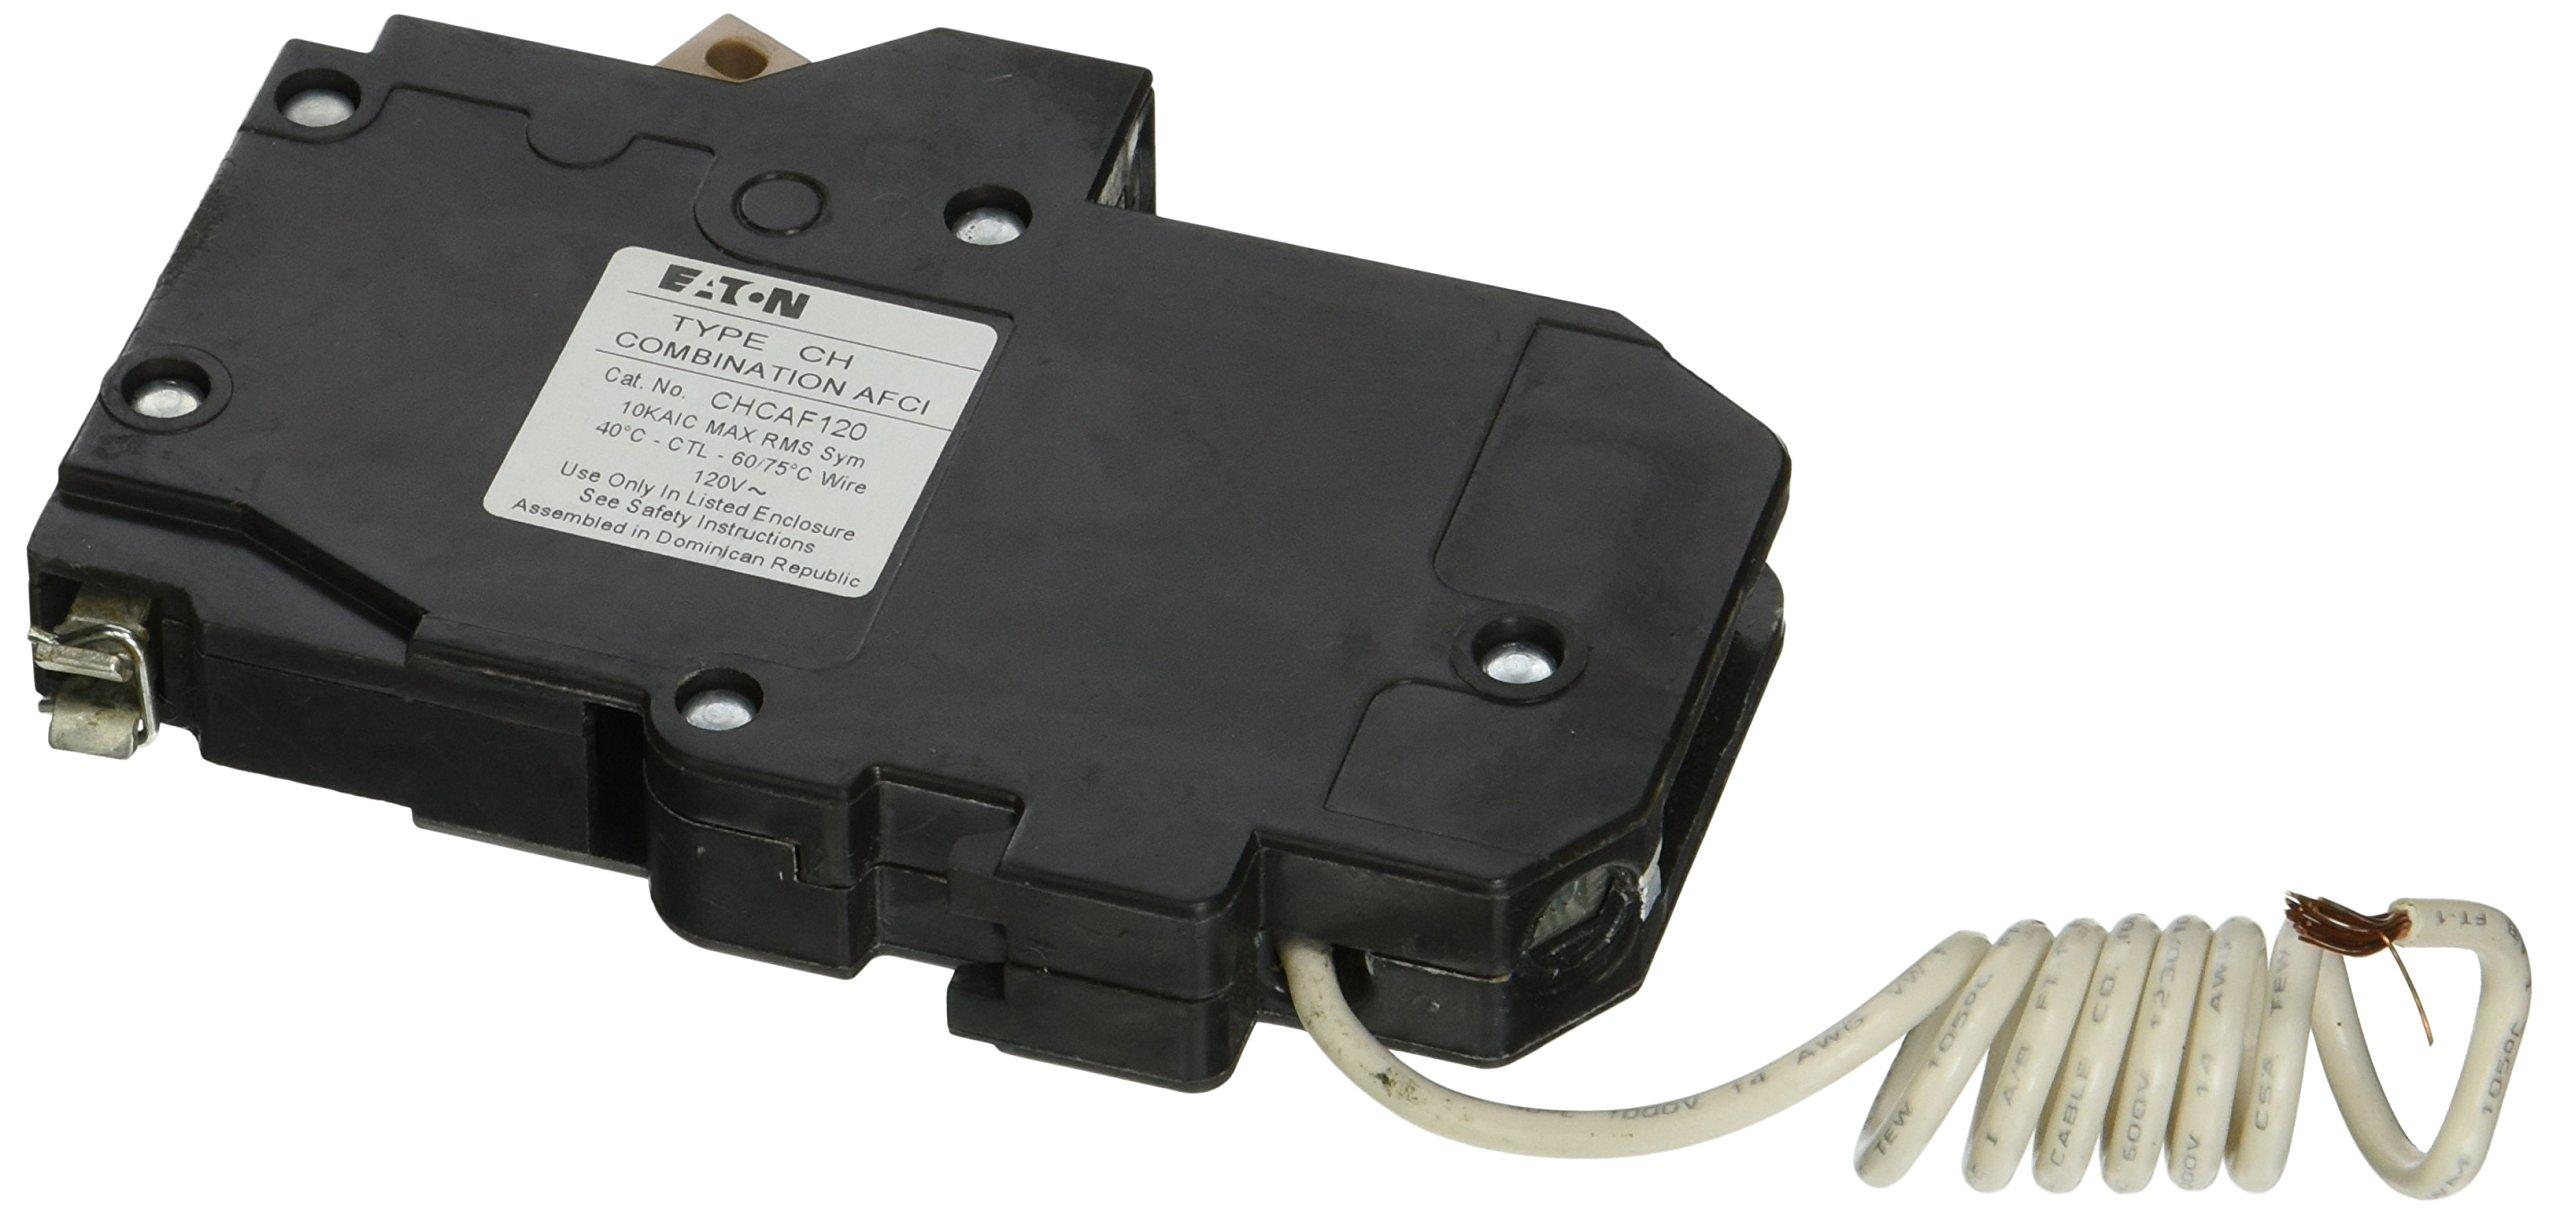 Eaton Corporation Chcaf120 Single Pole Cutler Hammer Combo Arc Fault Circuit Breaker, 20-Amp